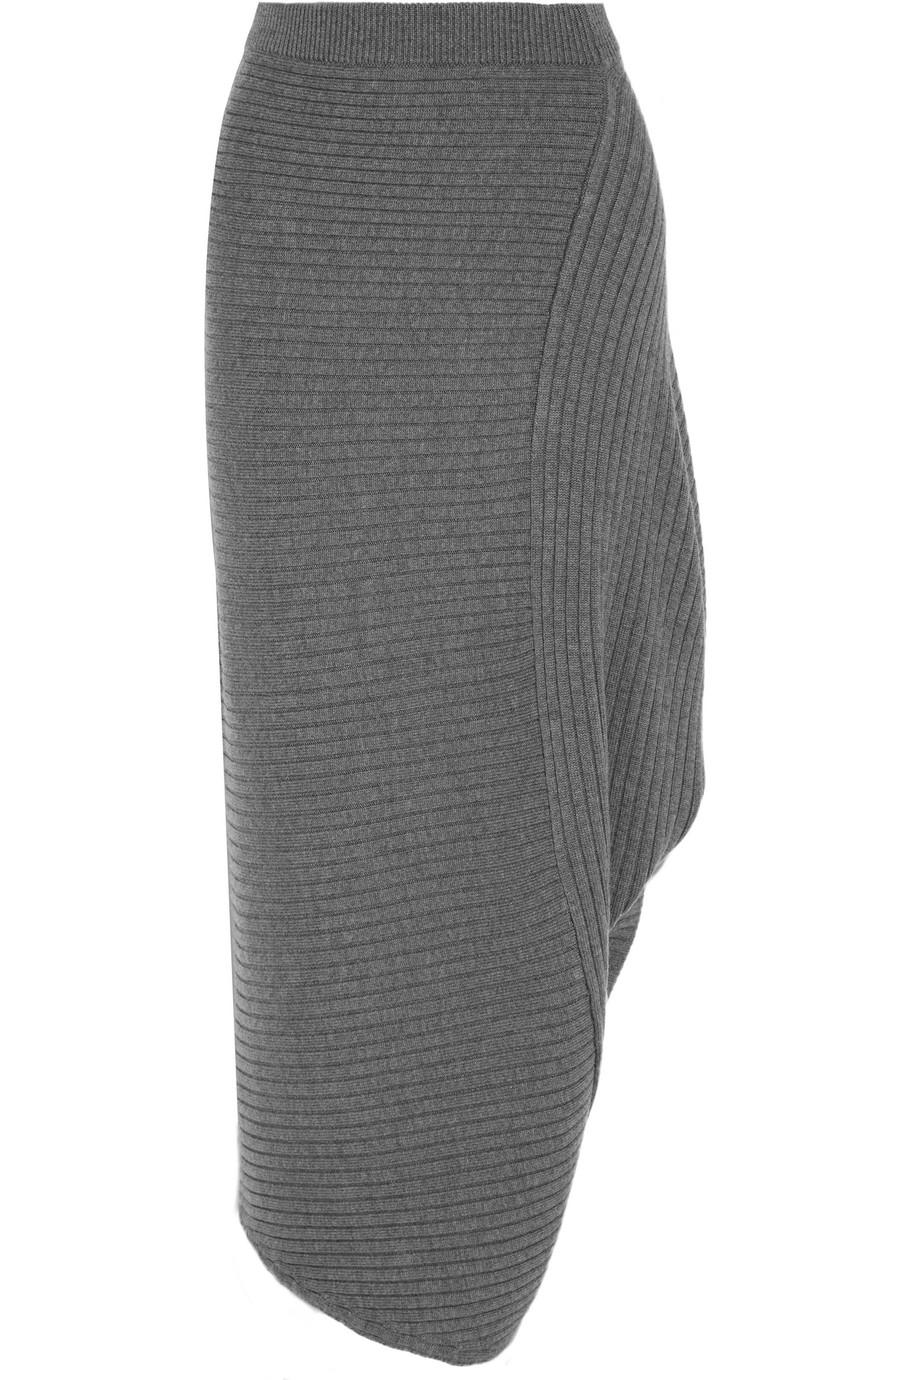 J.W.Anderson Asymmetric Ribbed Merino Wool Skirt, Gray, Women's